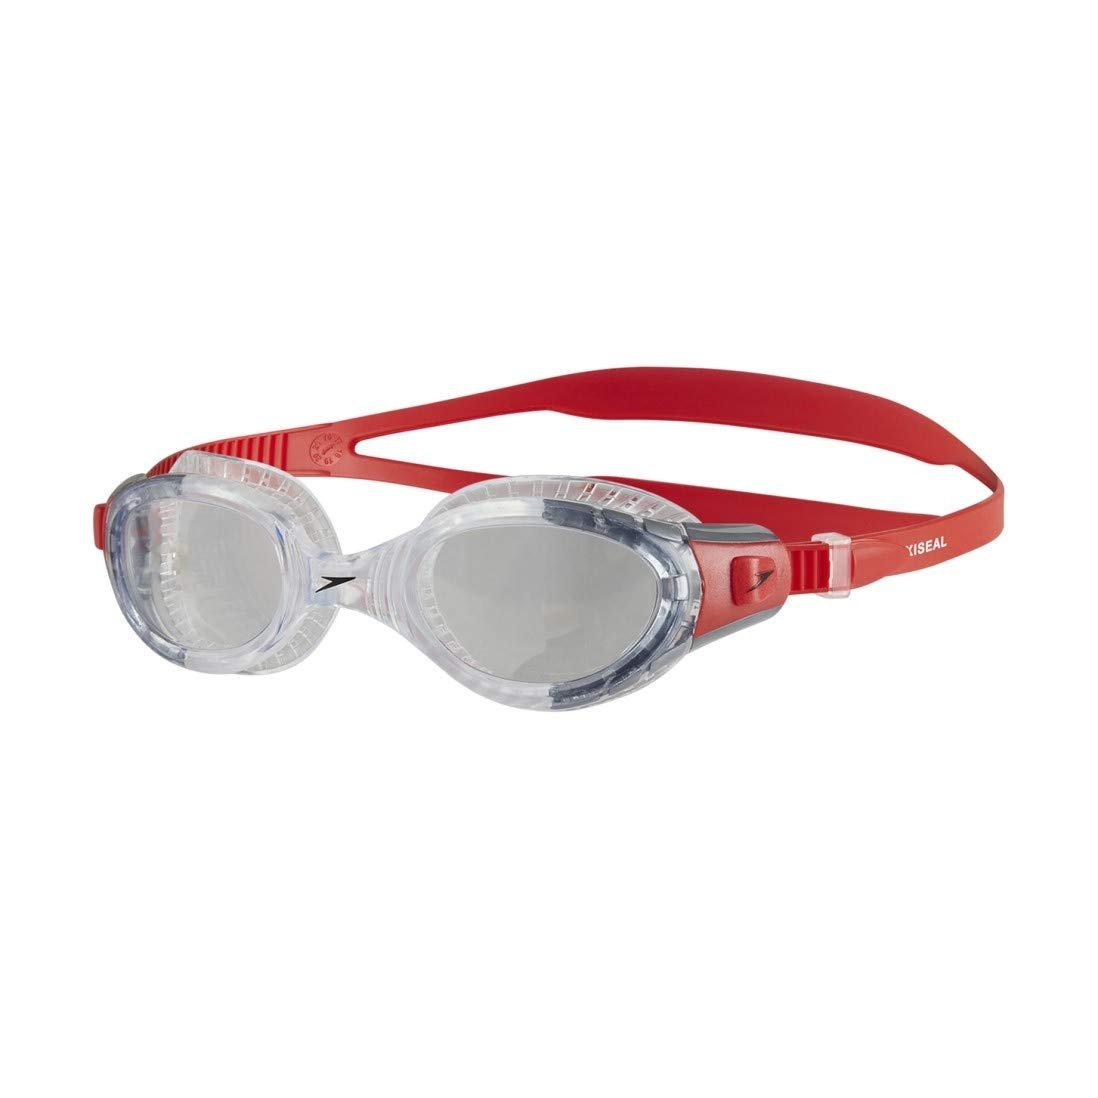 8//11532B979 *Brand New* Speedo Futura Biofuse Flexiseal Goggles